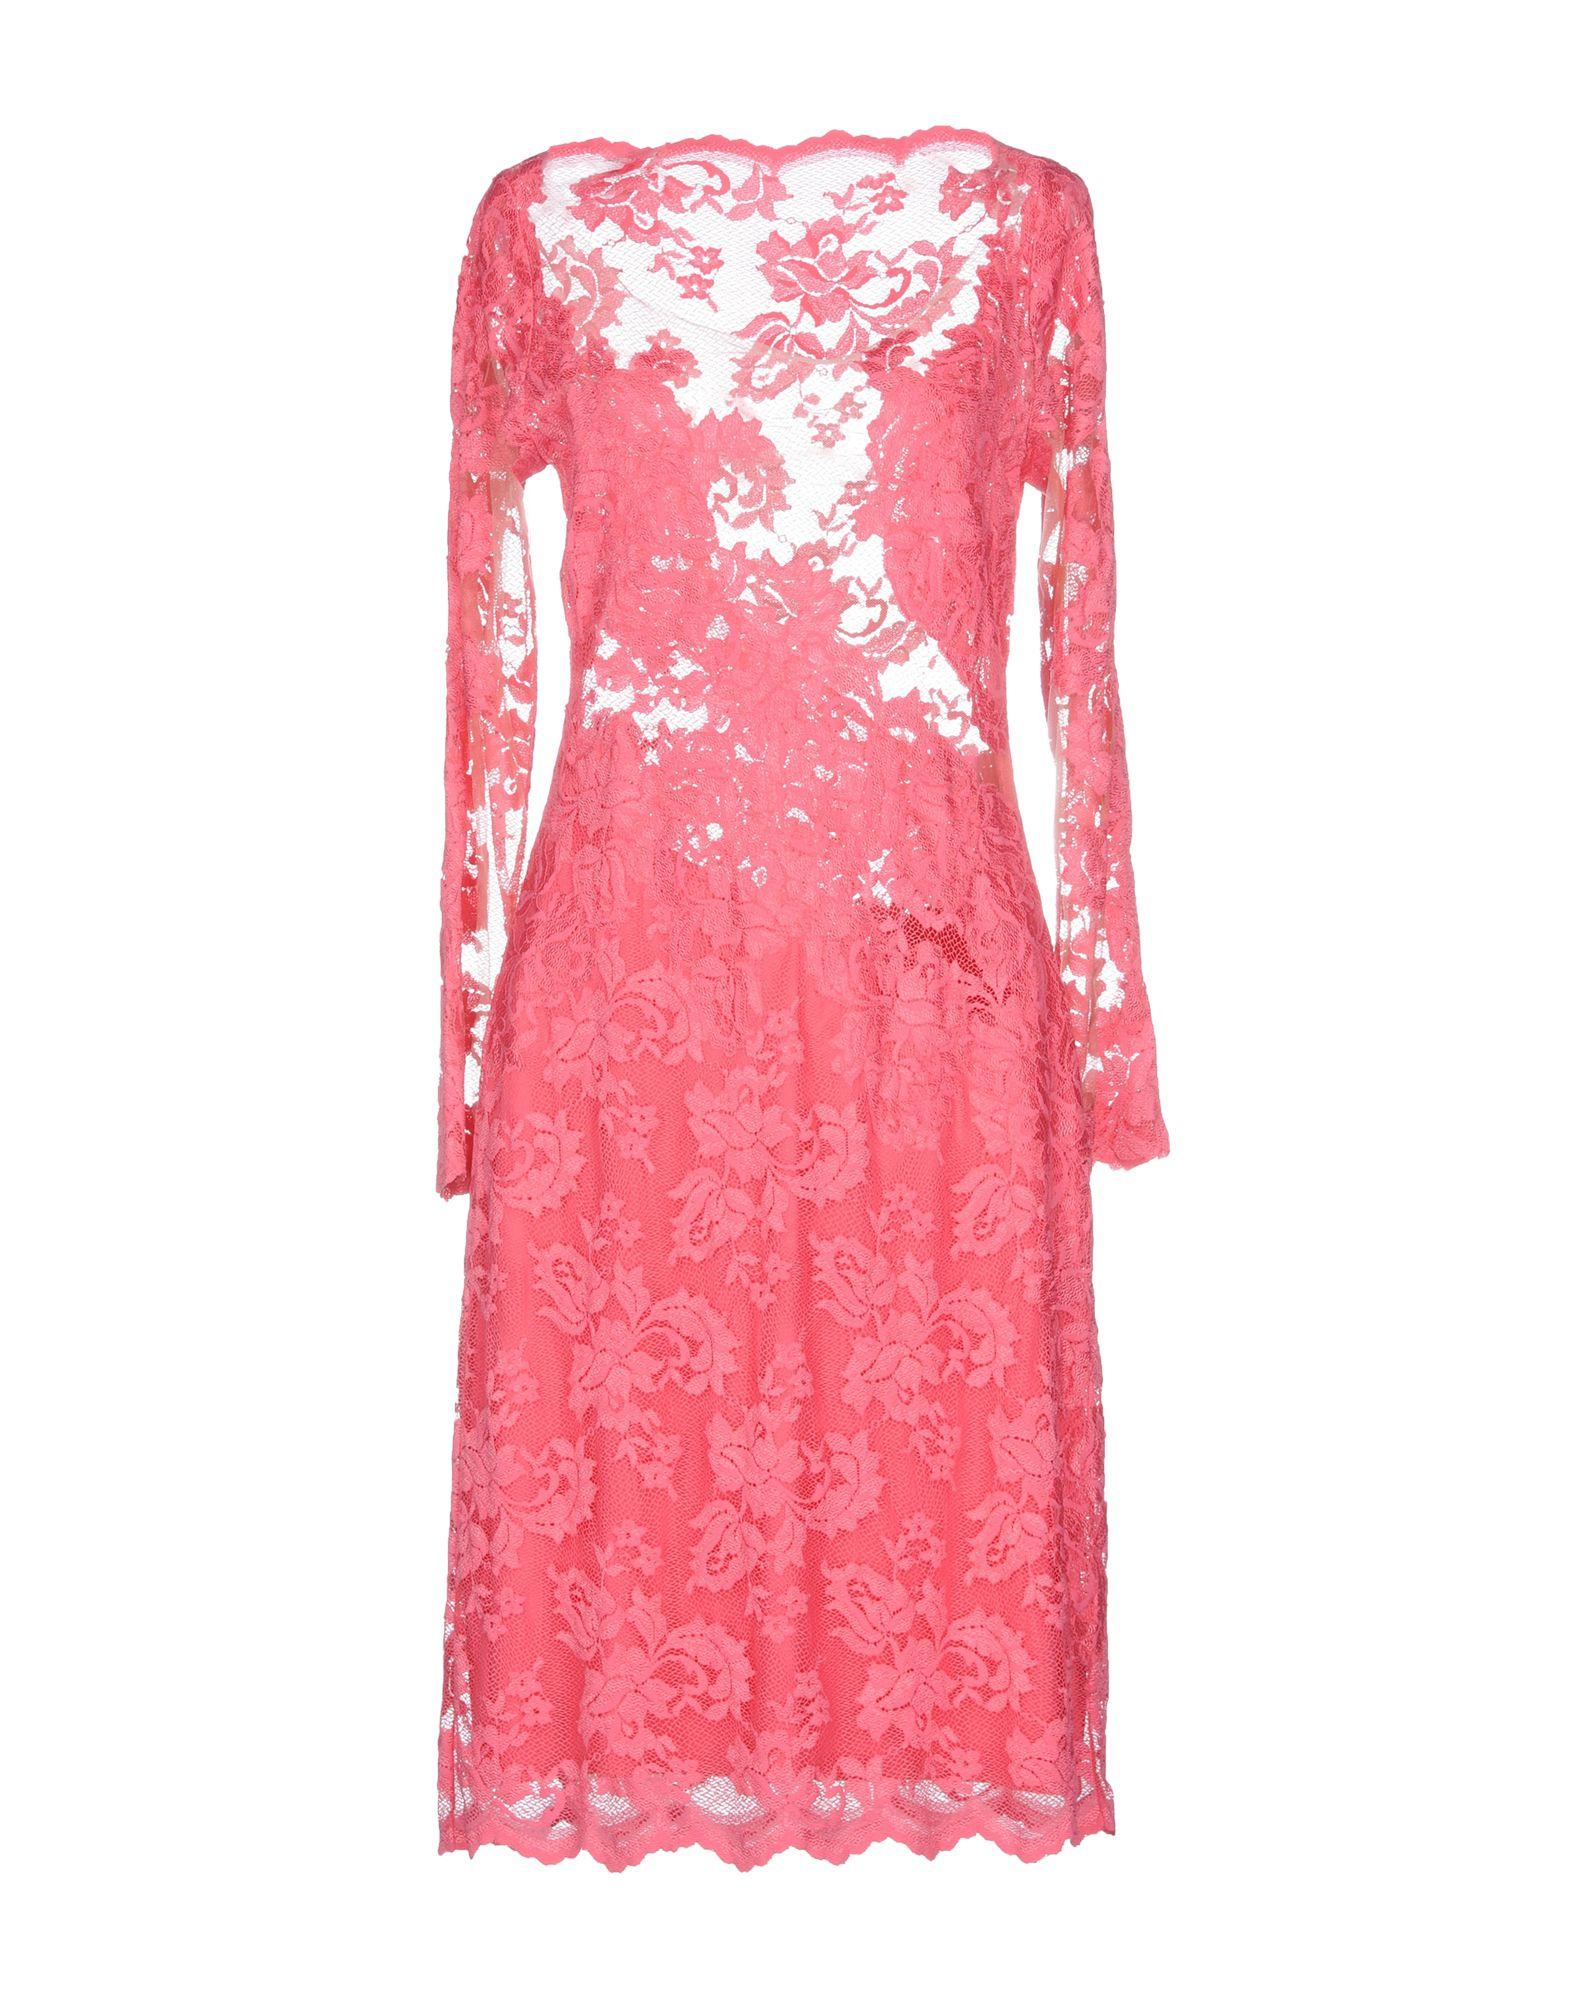 OLVI S Knee-Length Dress in Pink